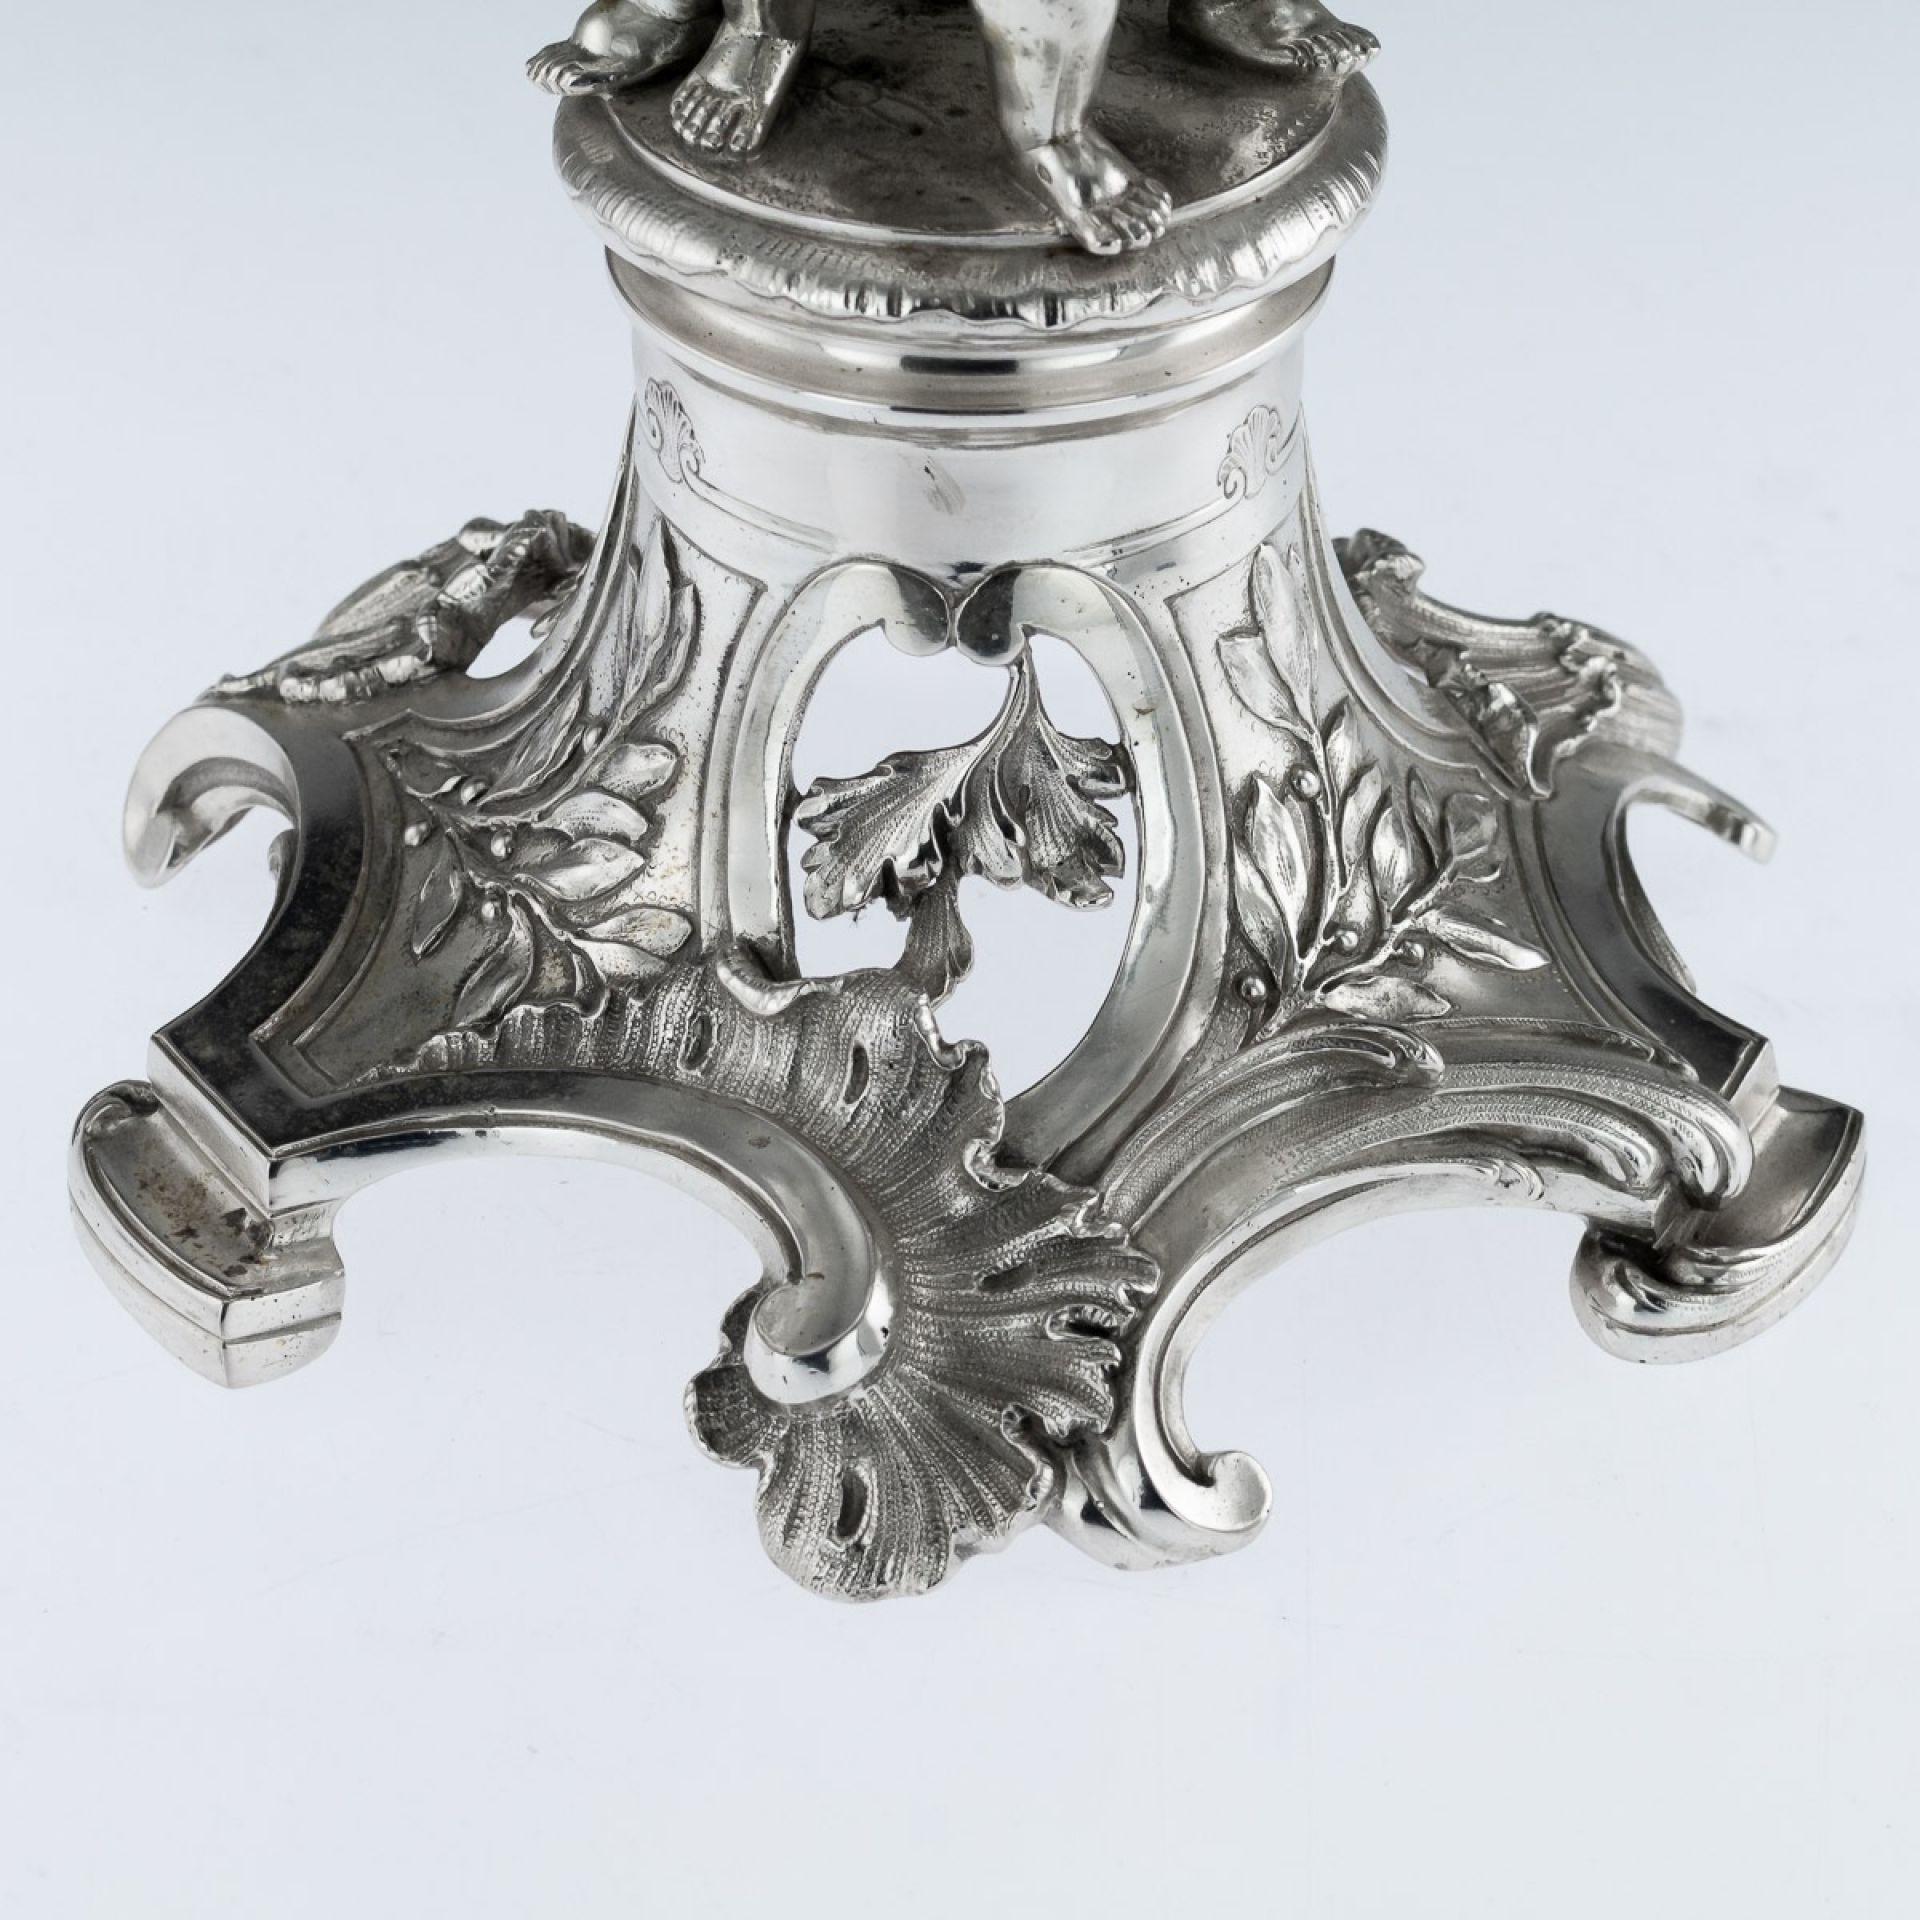 ANTIQUE 19thC AUSTRIAN SOLID SILVER PAIR CANDELABRA, WURBEL & SZOKALLY c.1890